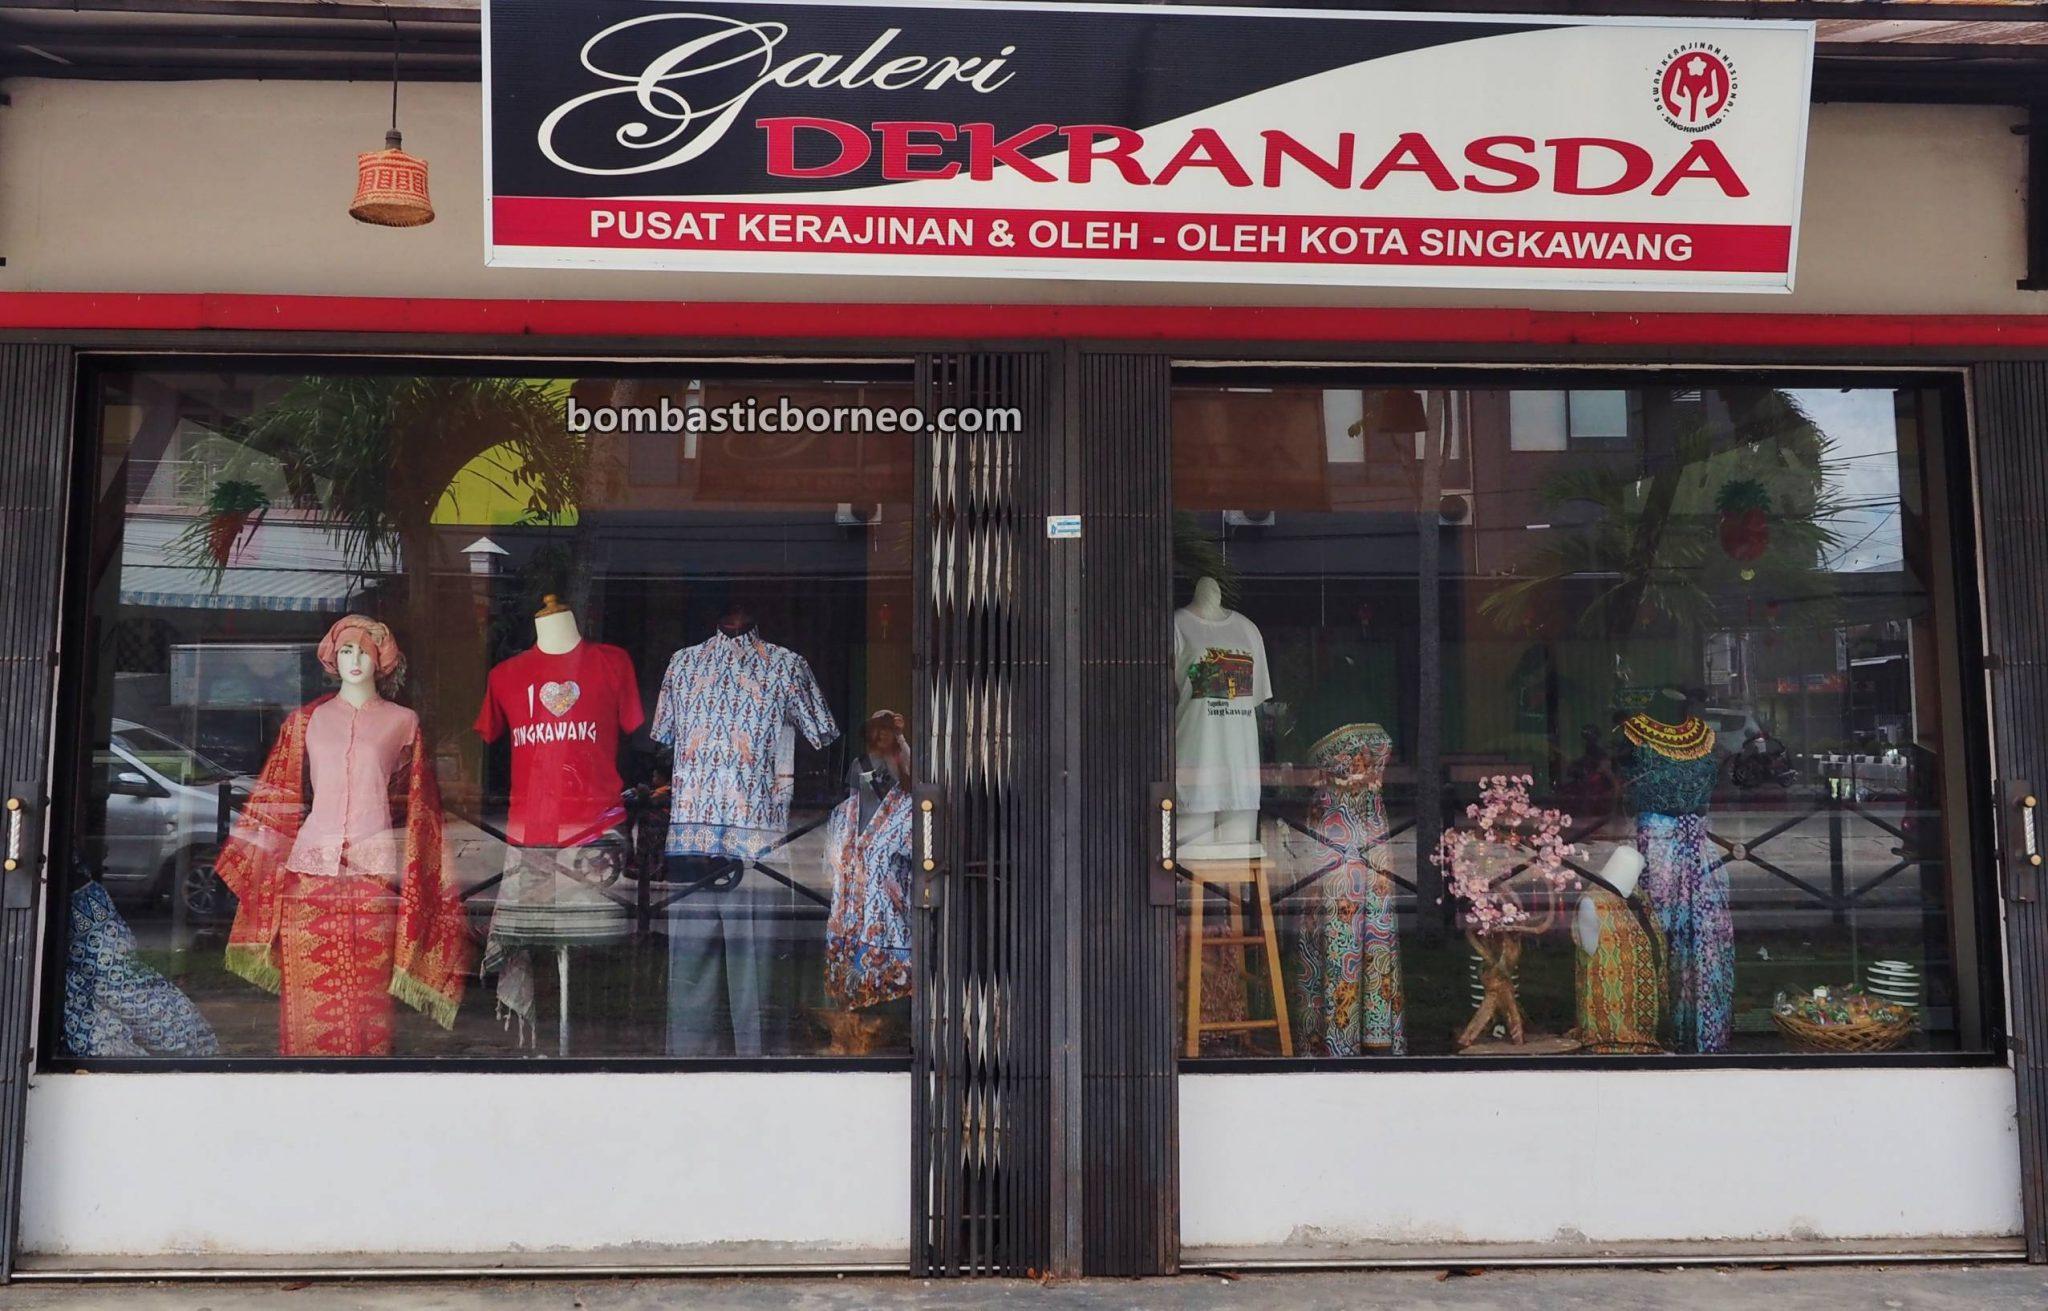 souvenir, crafts centre, backpackers, destination, Rattan products, rotan, tourism, tourist attraction, travel guide, Borneo, 婆罗洲西加里曼丹, 印尼山口洋